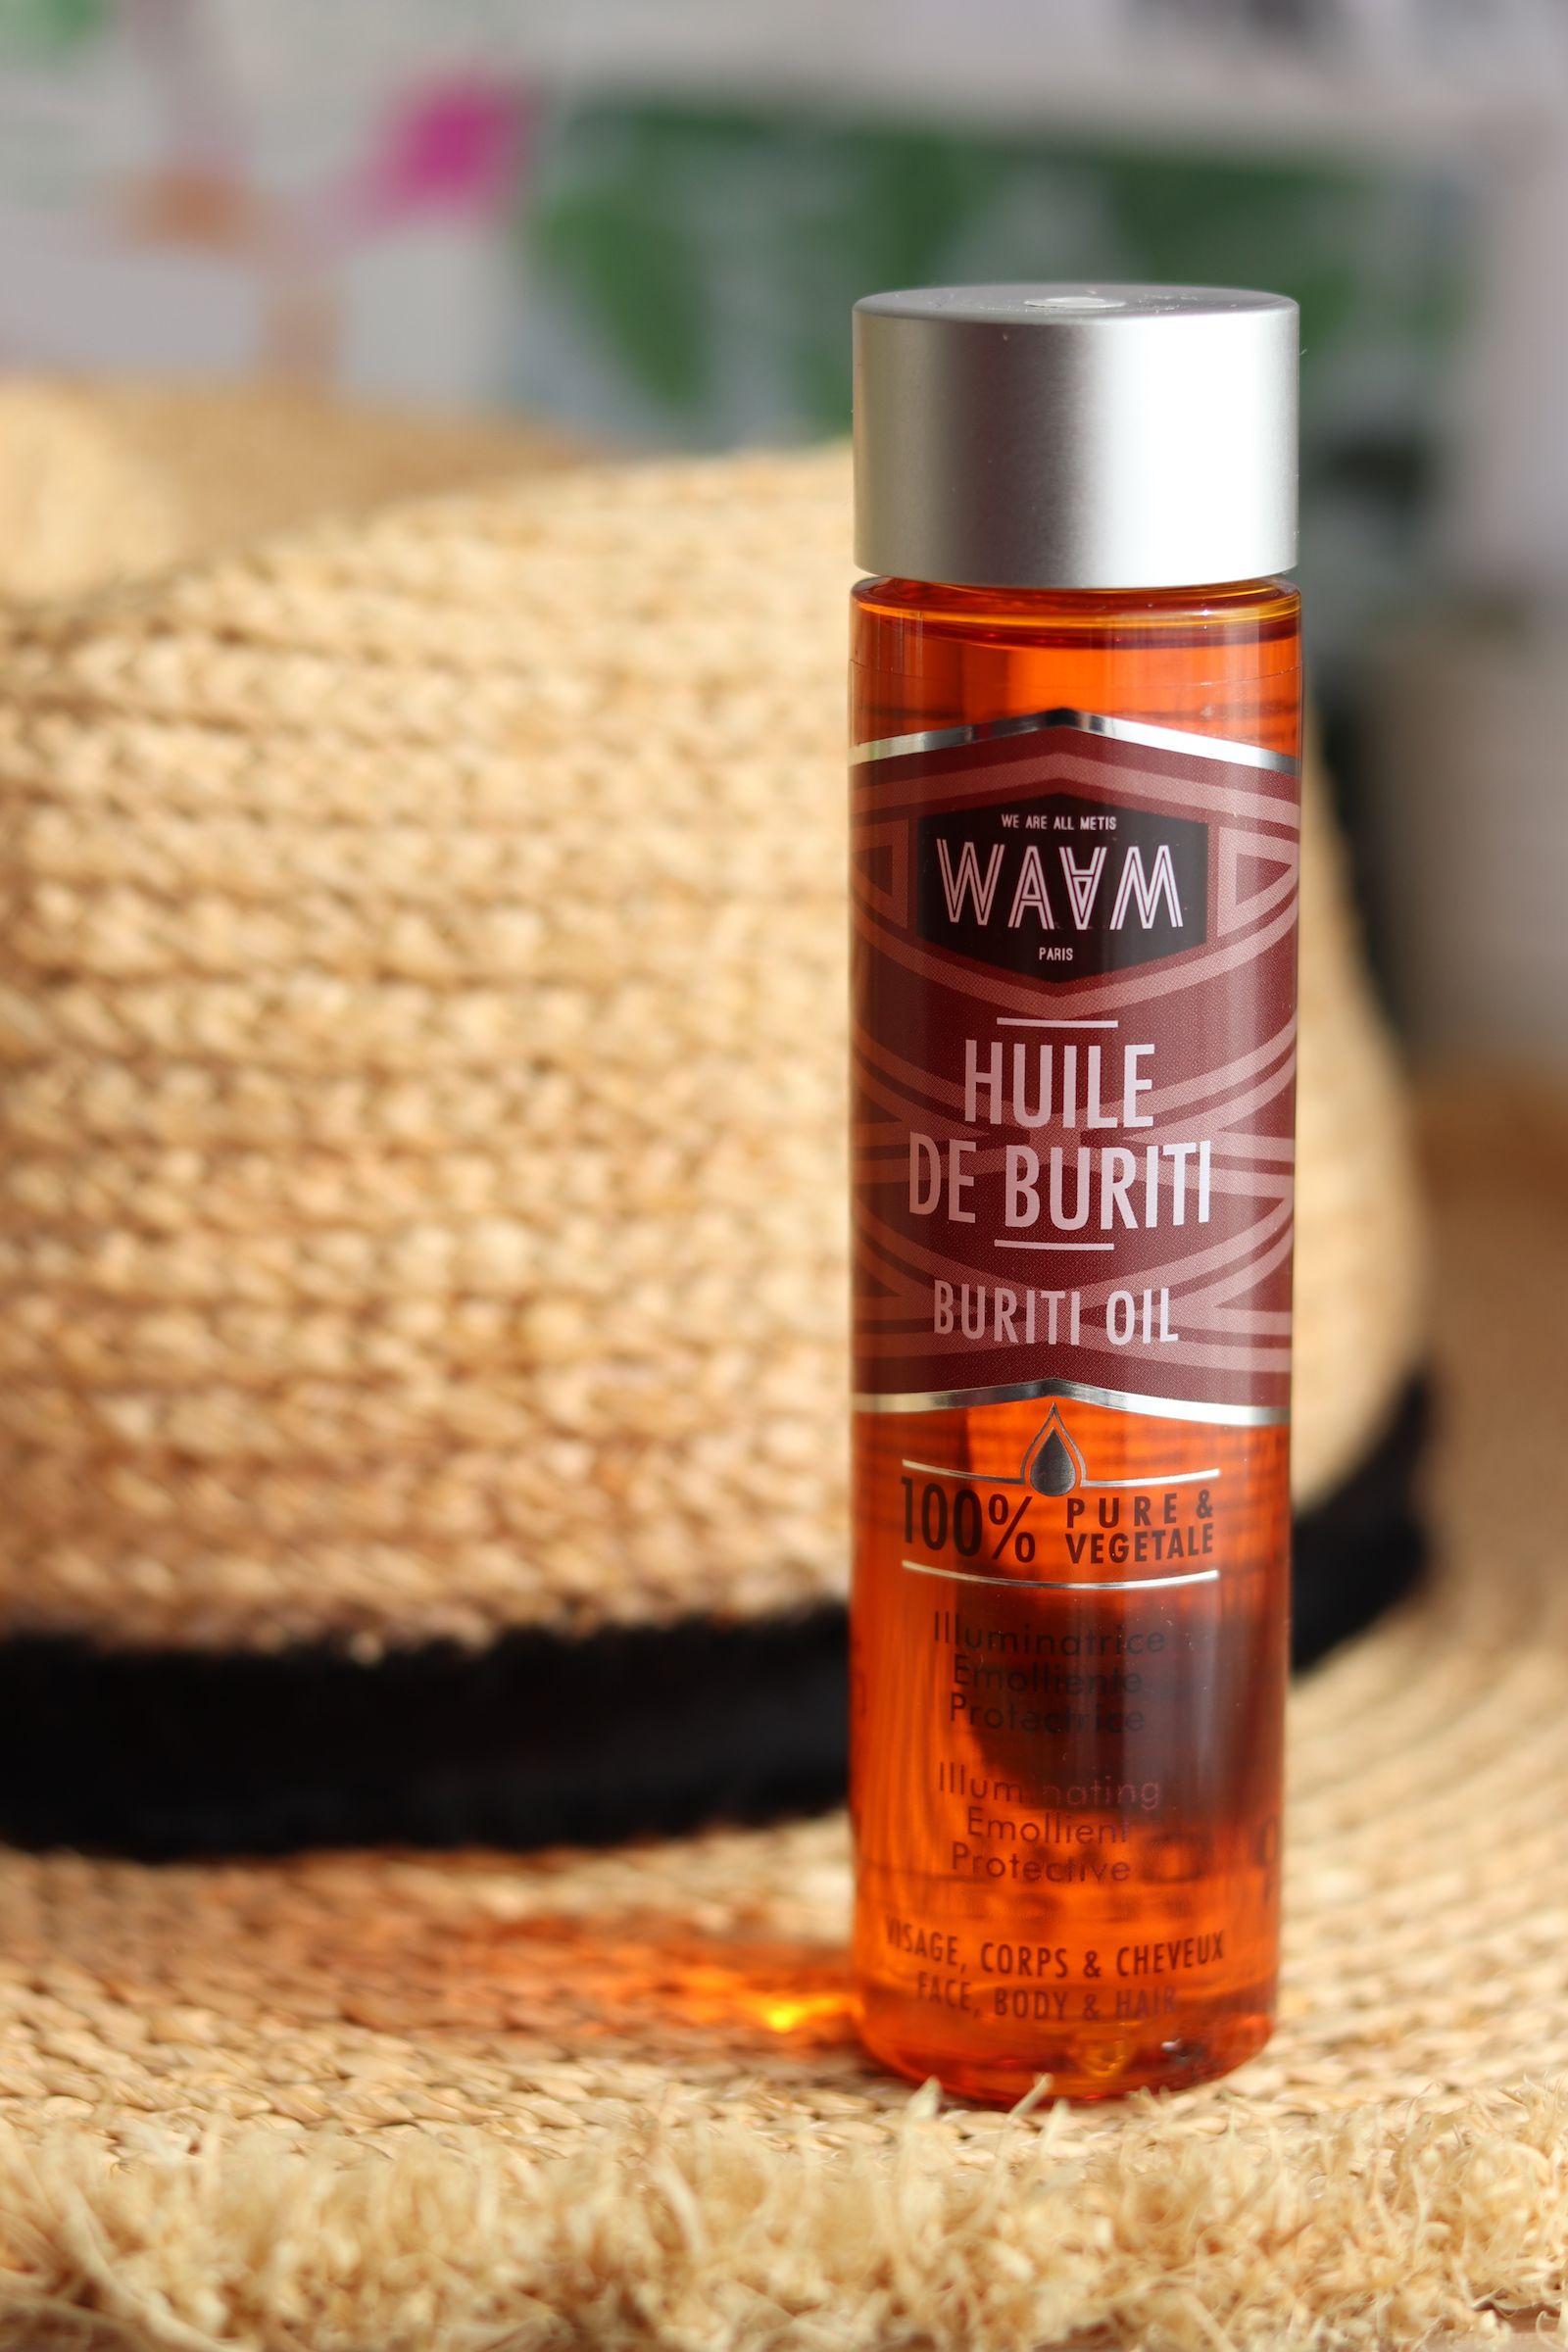 BRONZER SANS SOLEIL, BURITI CHERIE #1 | Astuces pour bronzer, Autobronzant naturel, Parfum fait ...